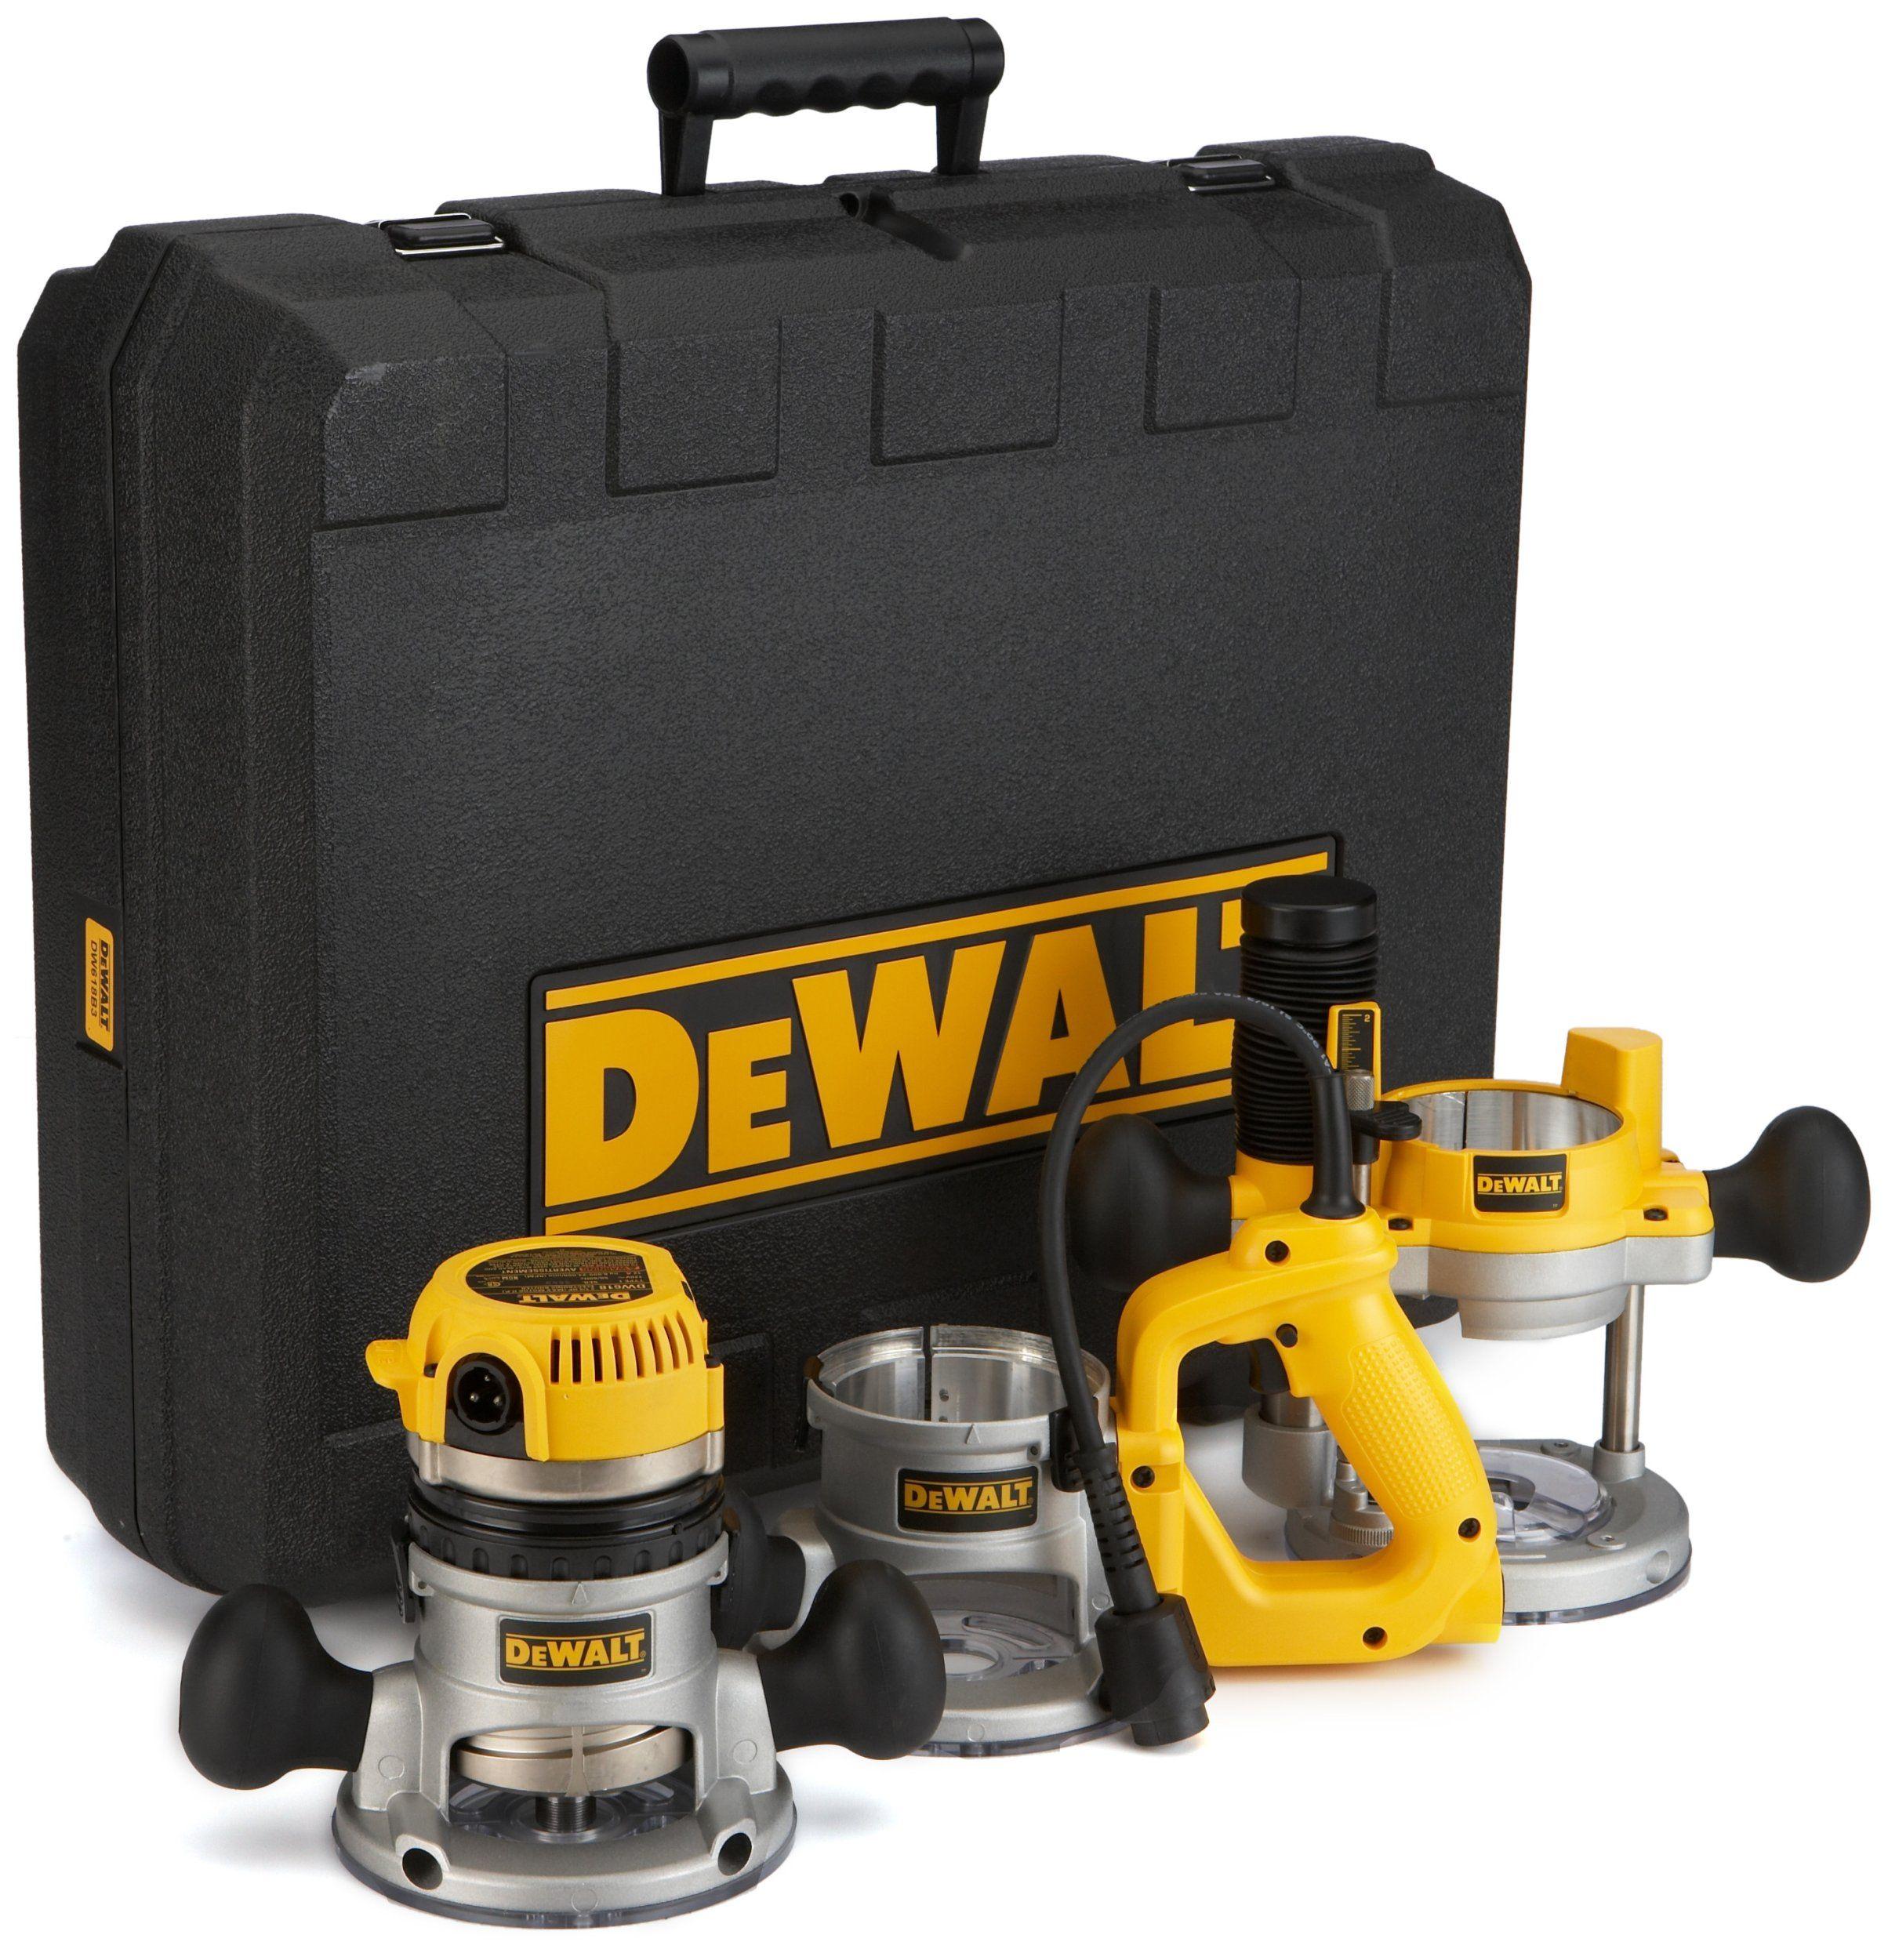 Dewalt Dw618b3 12 Amp 2 1 4 Horsepower Plunge Base And Fixed Base Dewalt Router Amazon Com Wood Router Dewalt